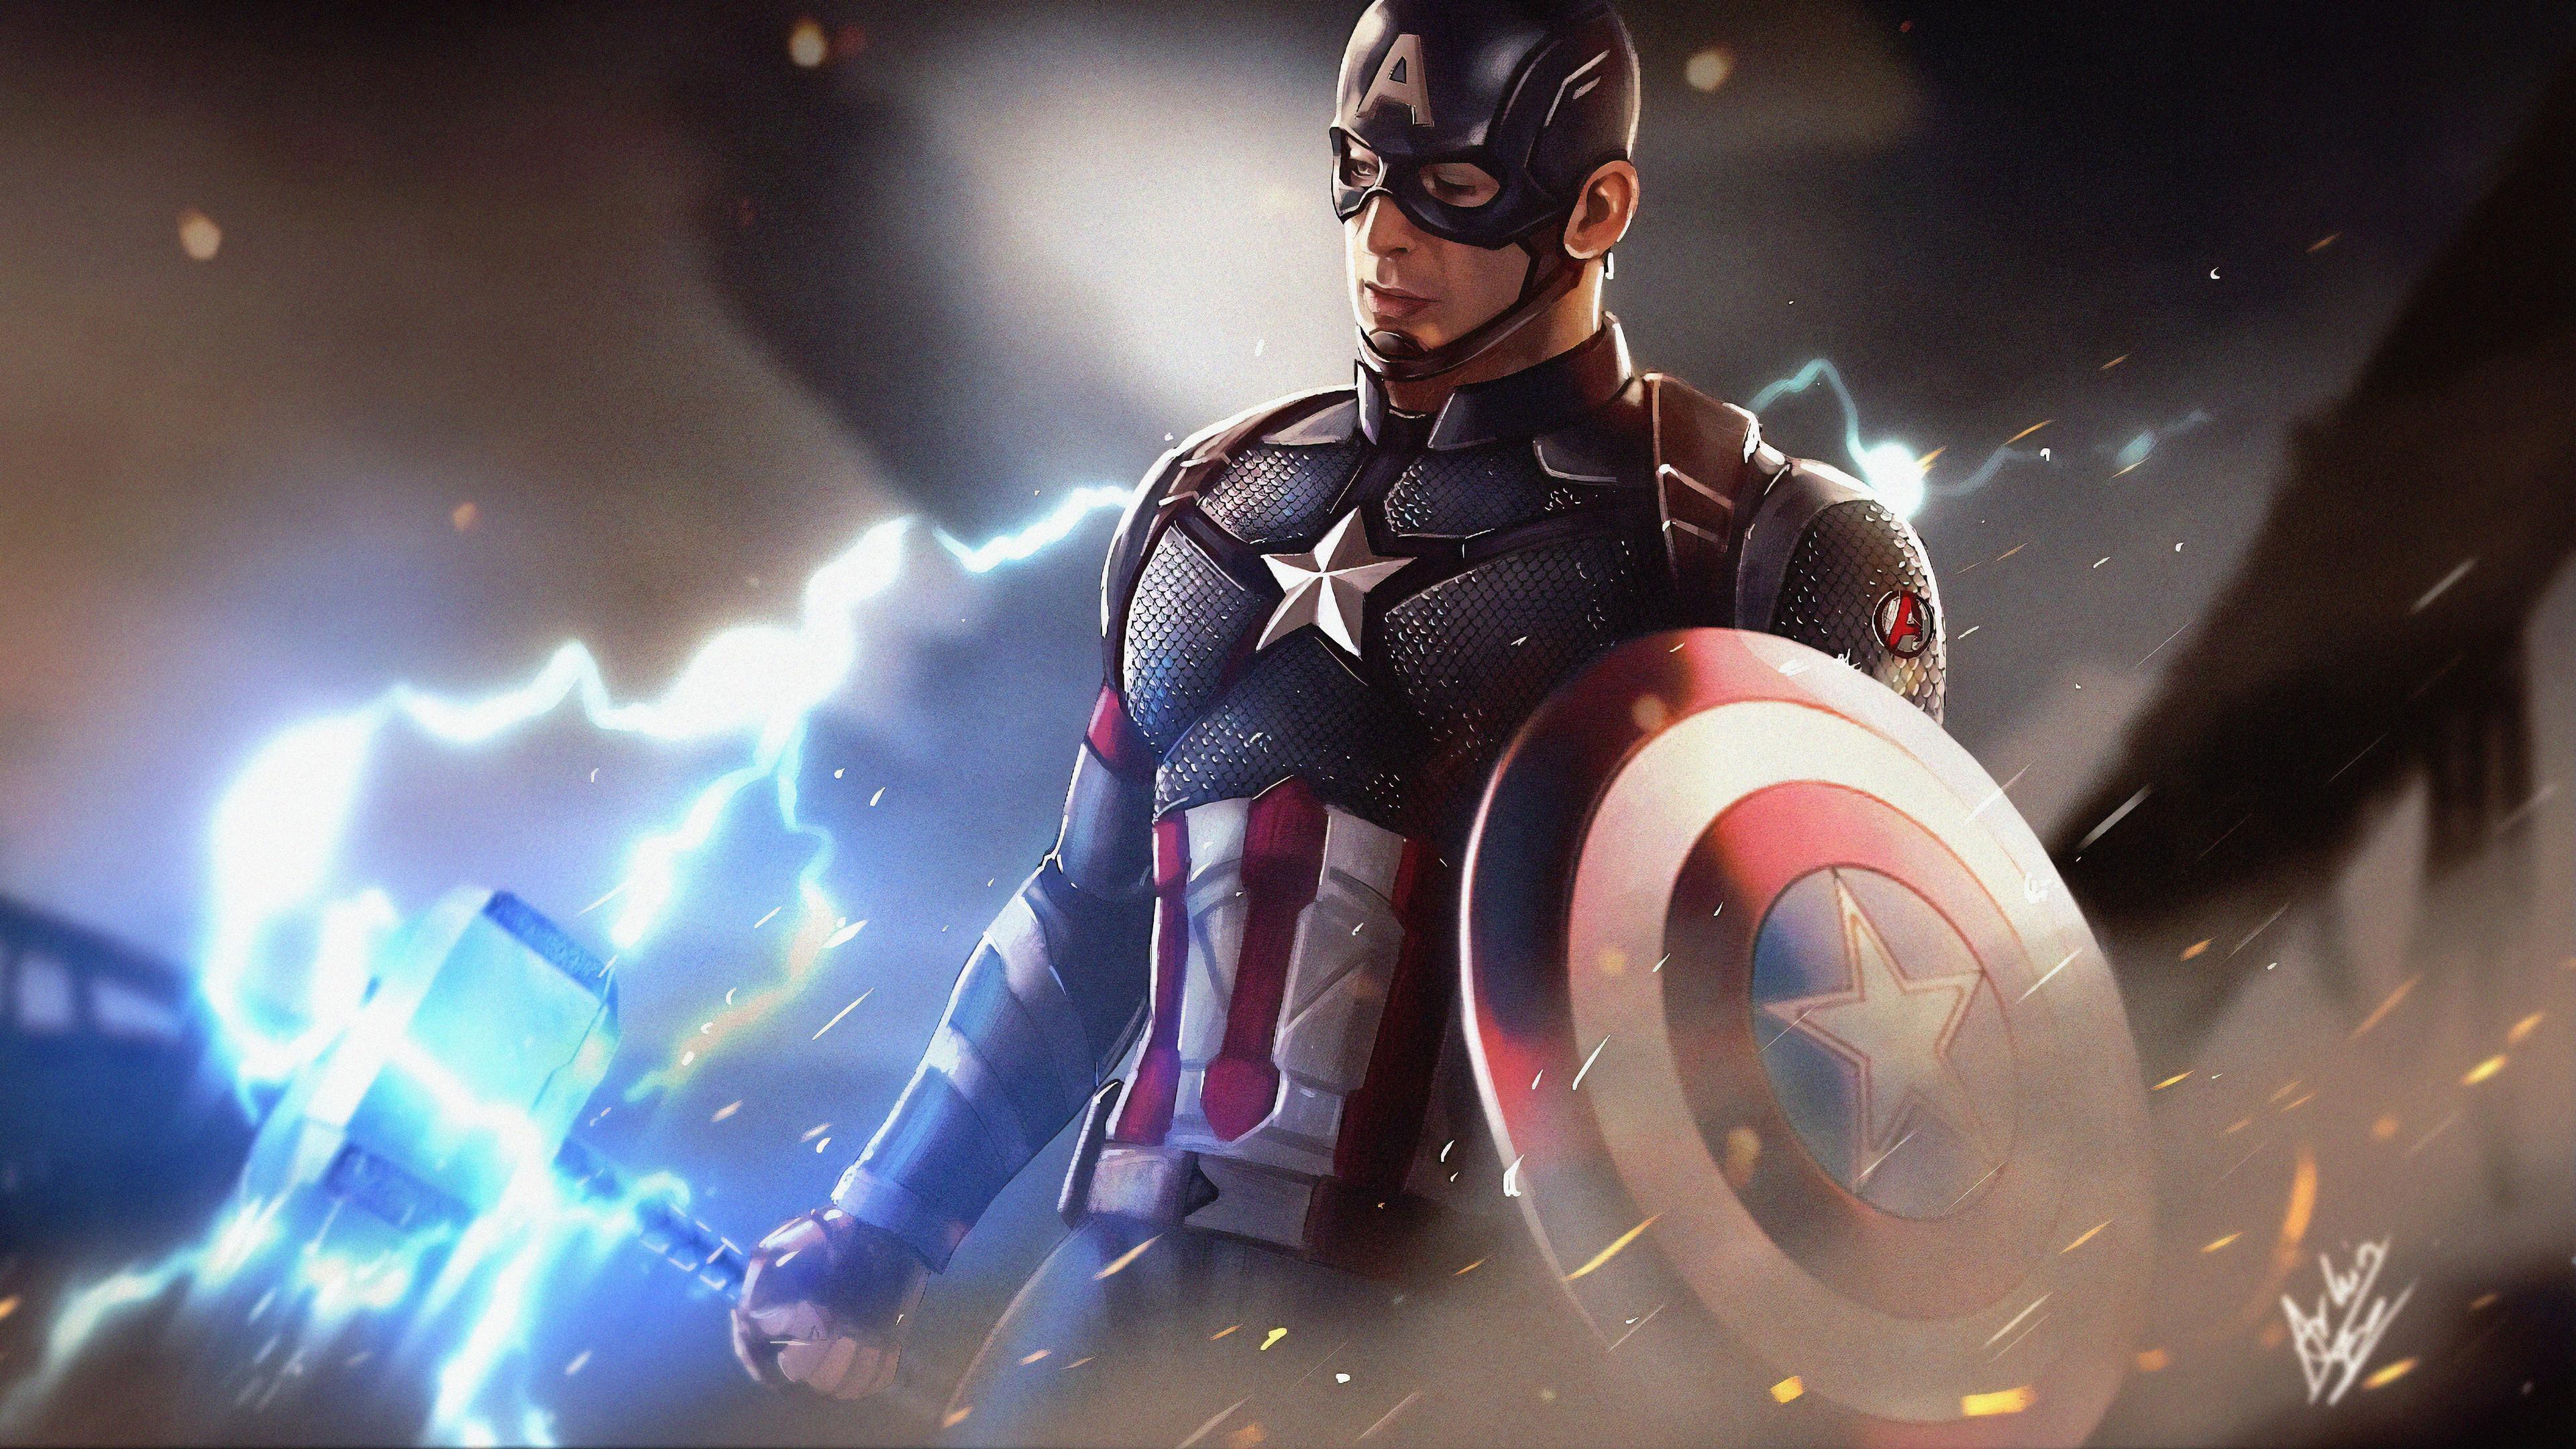 4k Captain America Artwork, HD Superheroes, 4k Wallpapers ...